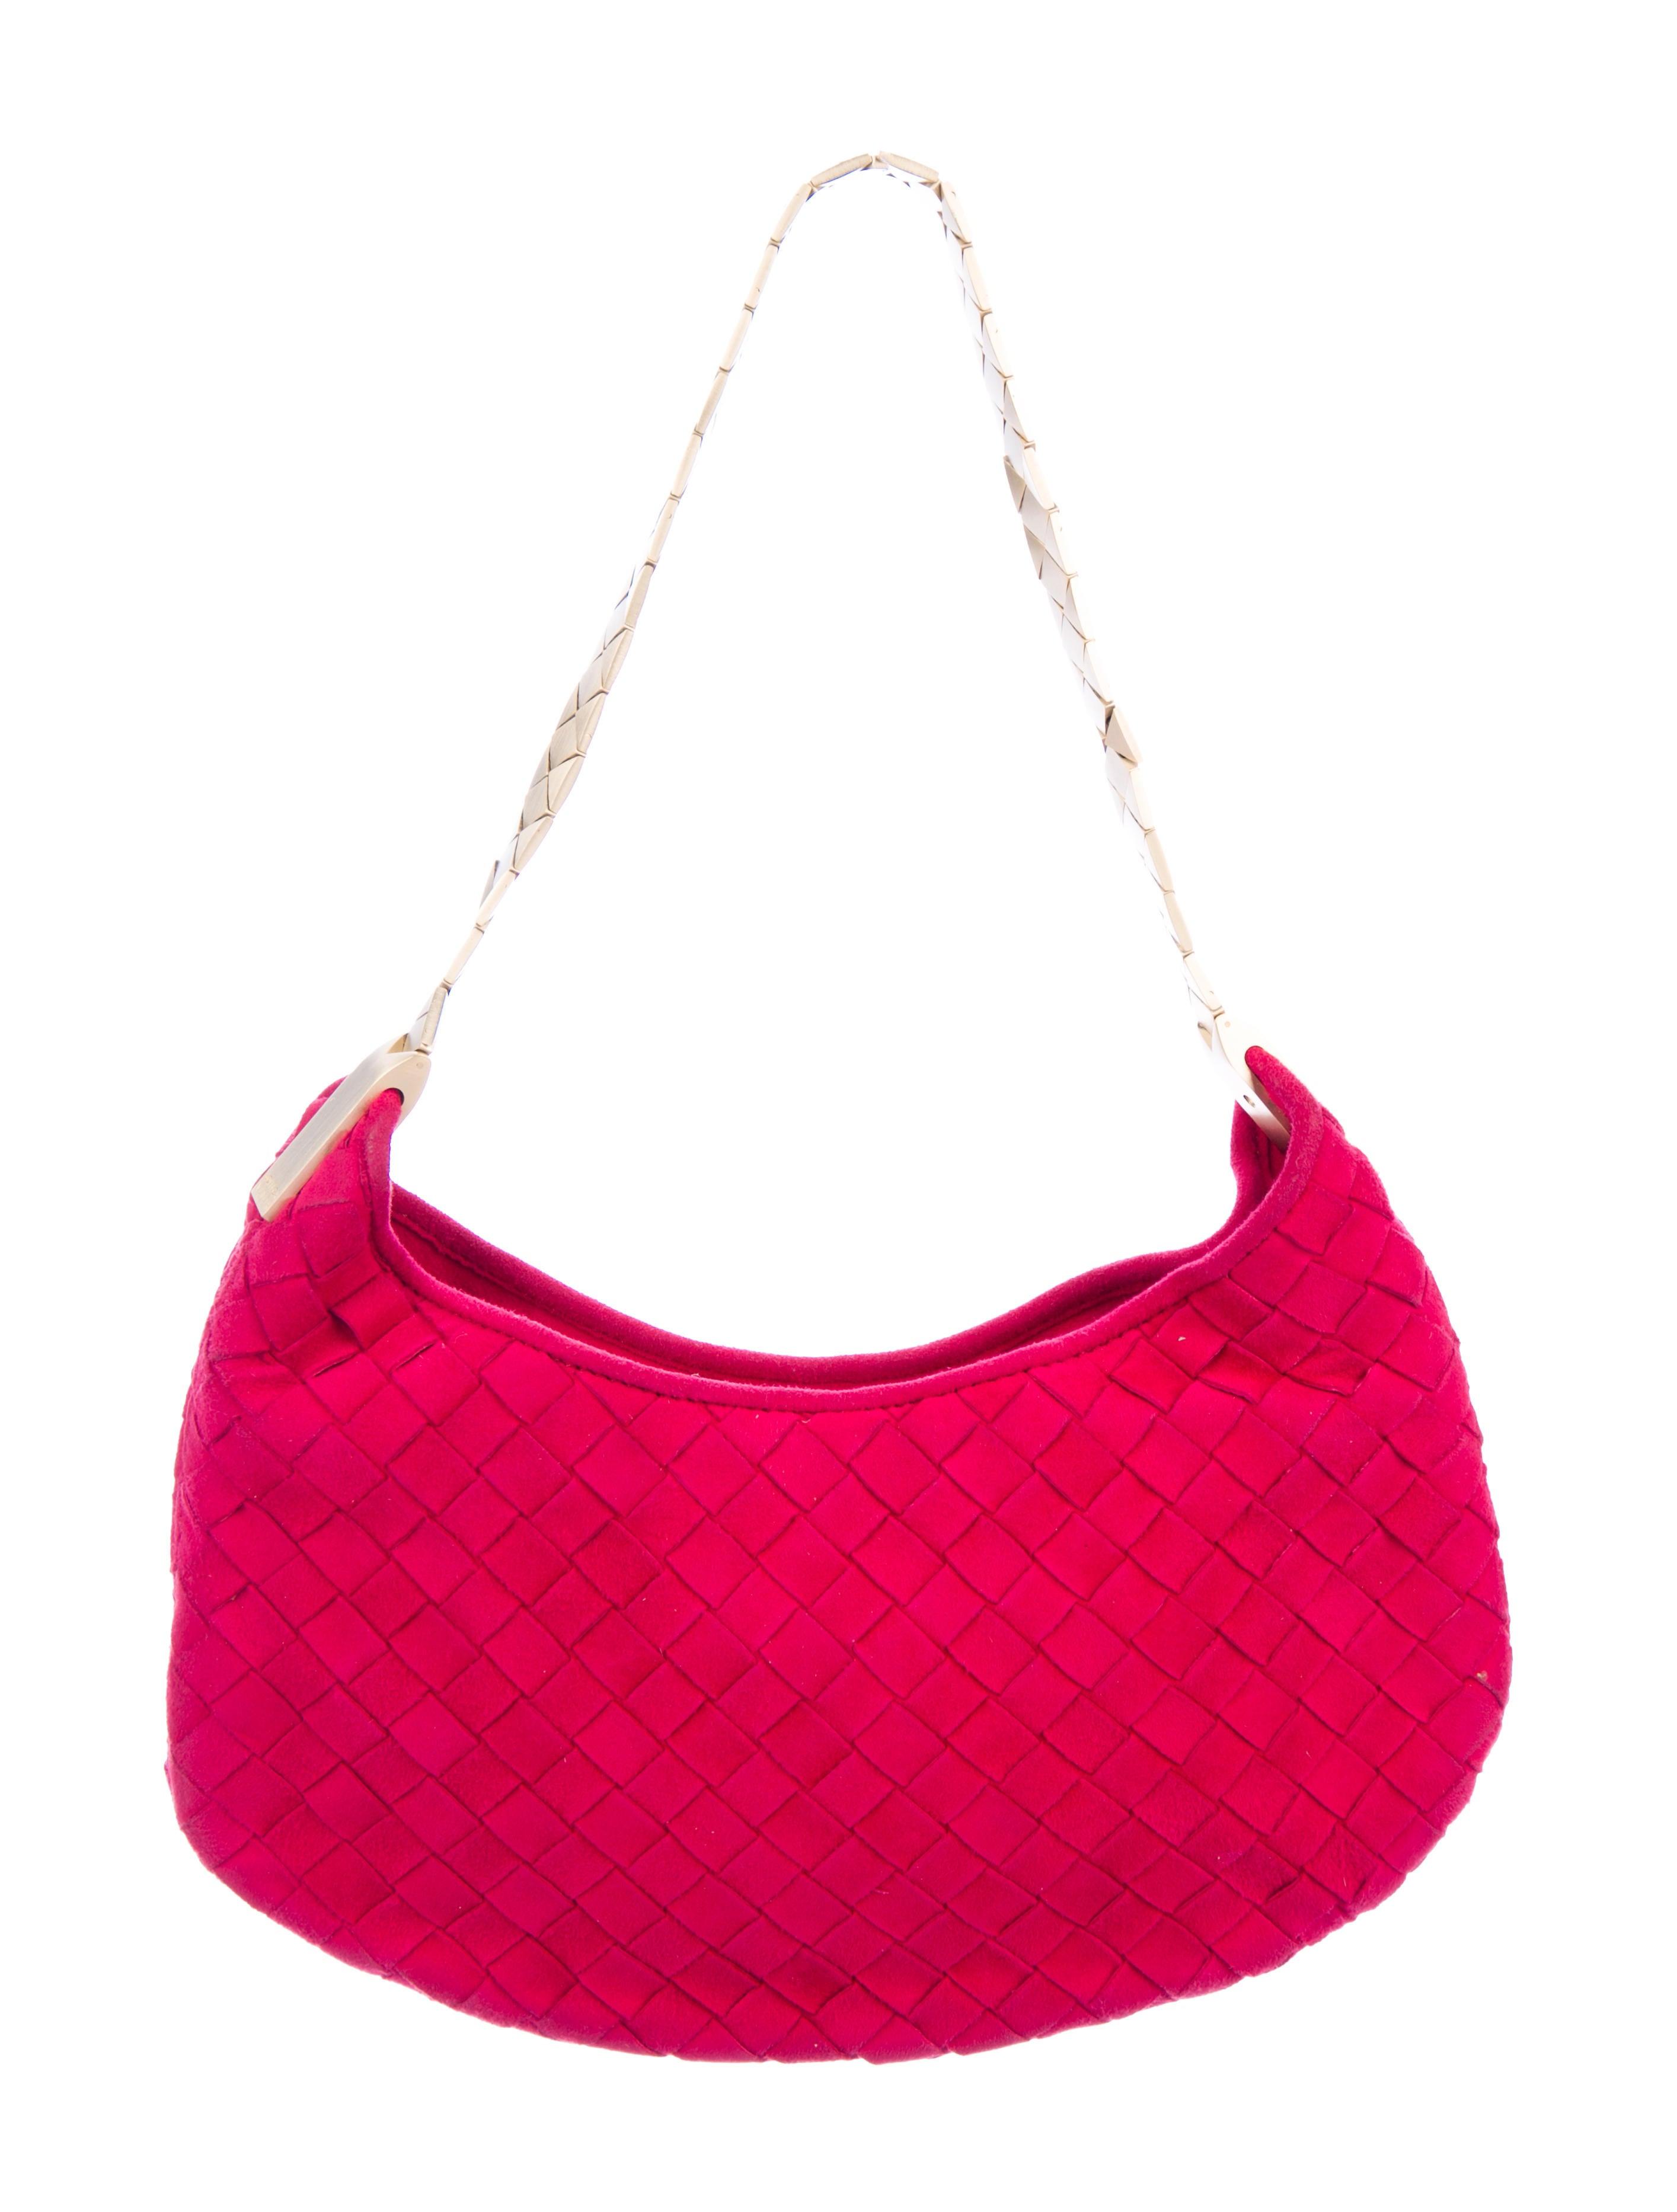 e791fd3cd57 Intrecciato Vintage Suede Mini Bag Bottega Veneta 8PYwAA for ...